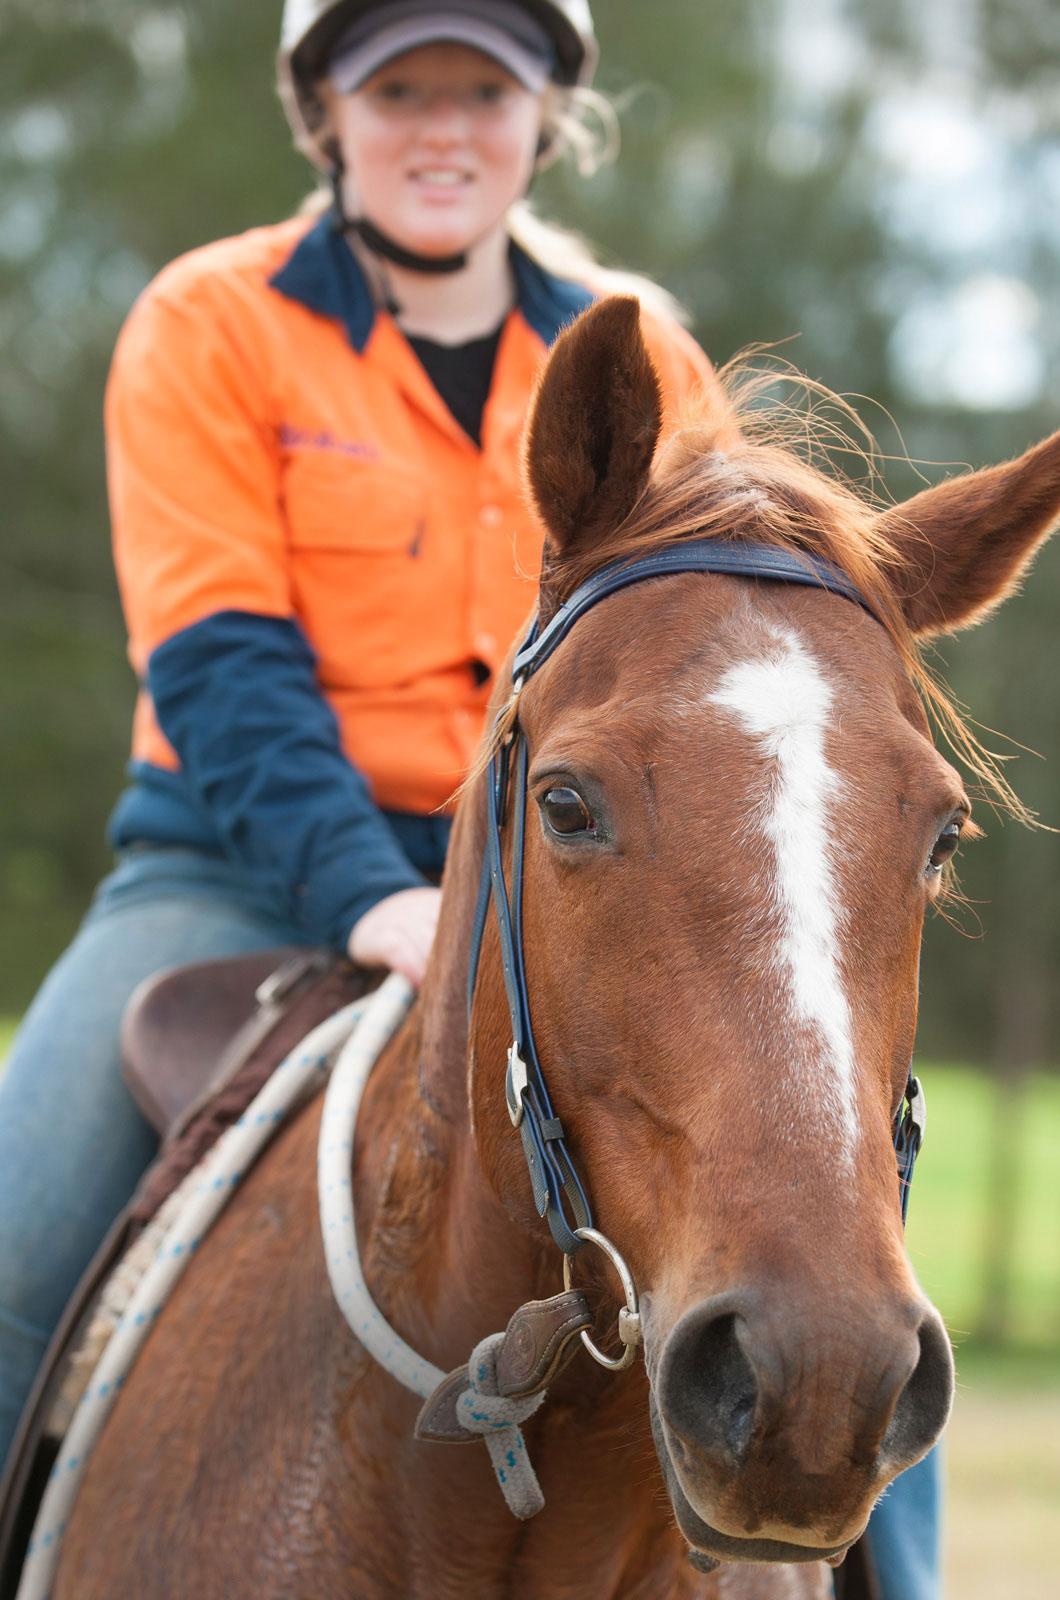 Female student on horse